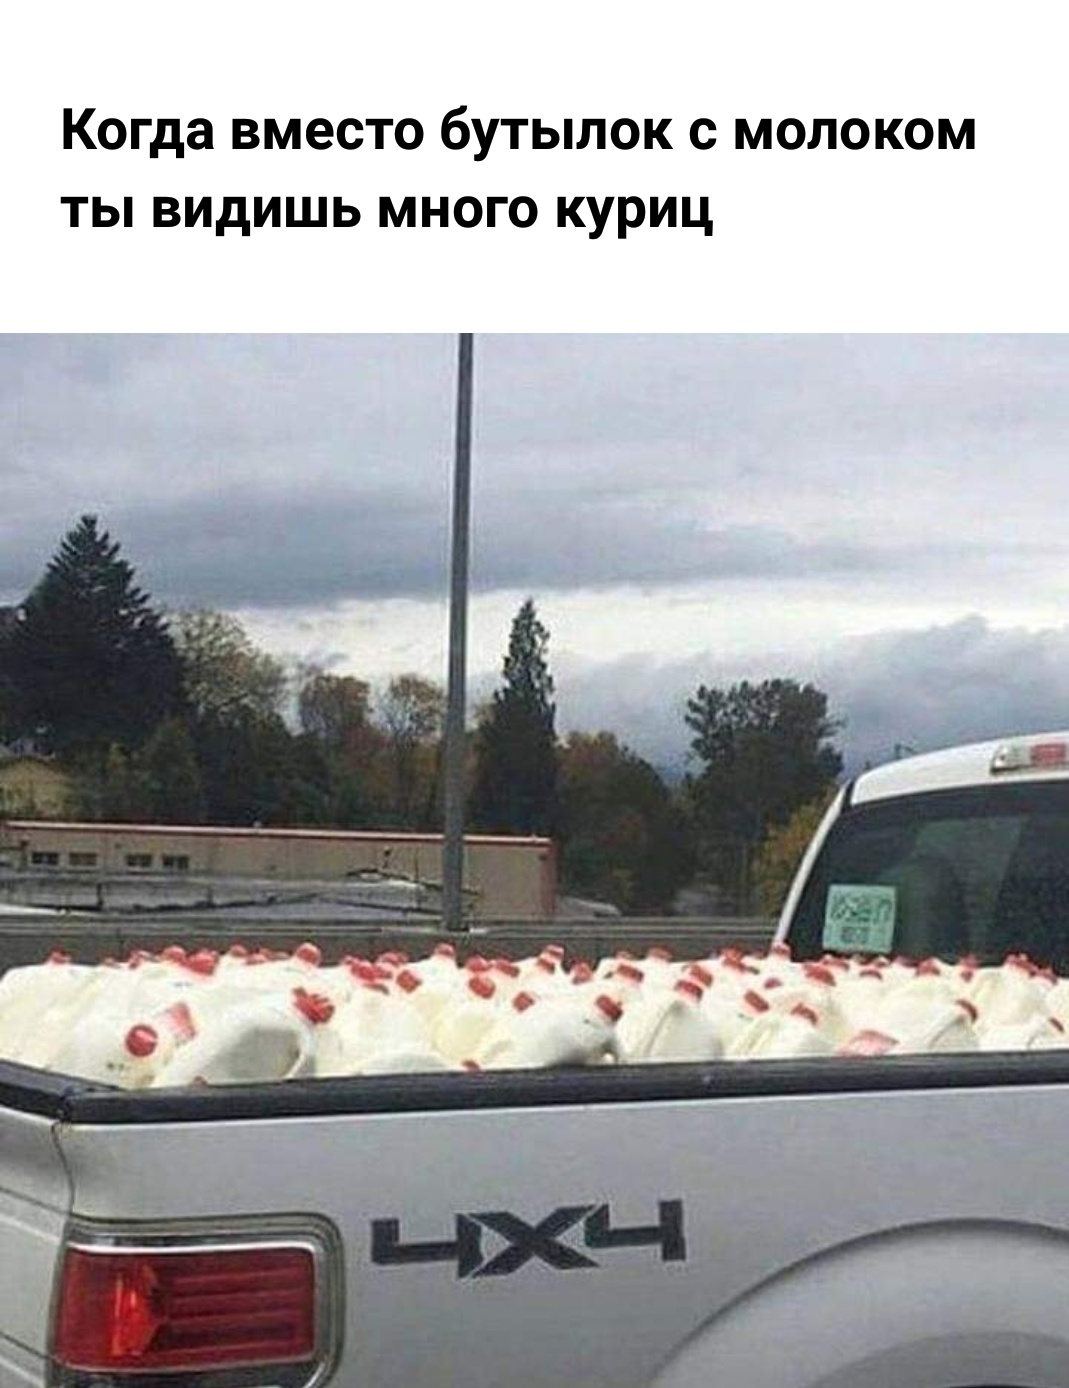 http://s7.uplds.ru/uHh98.jpg